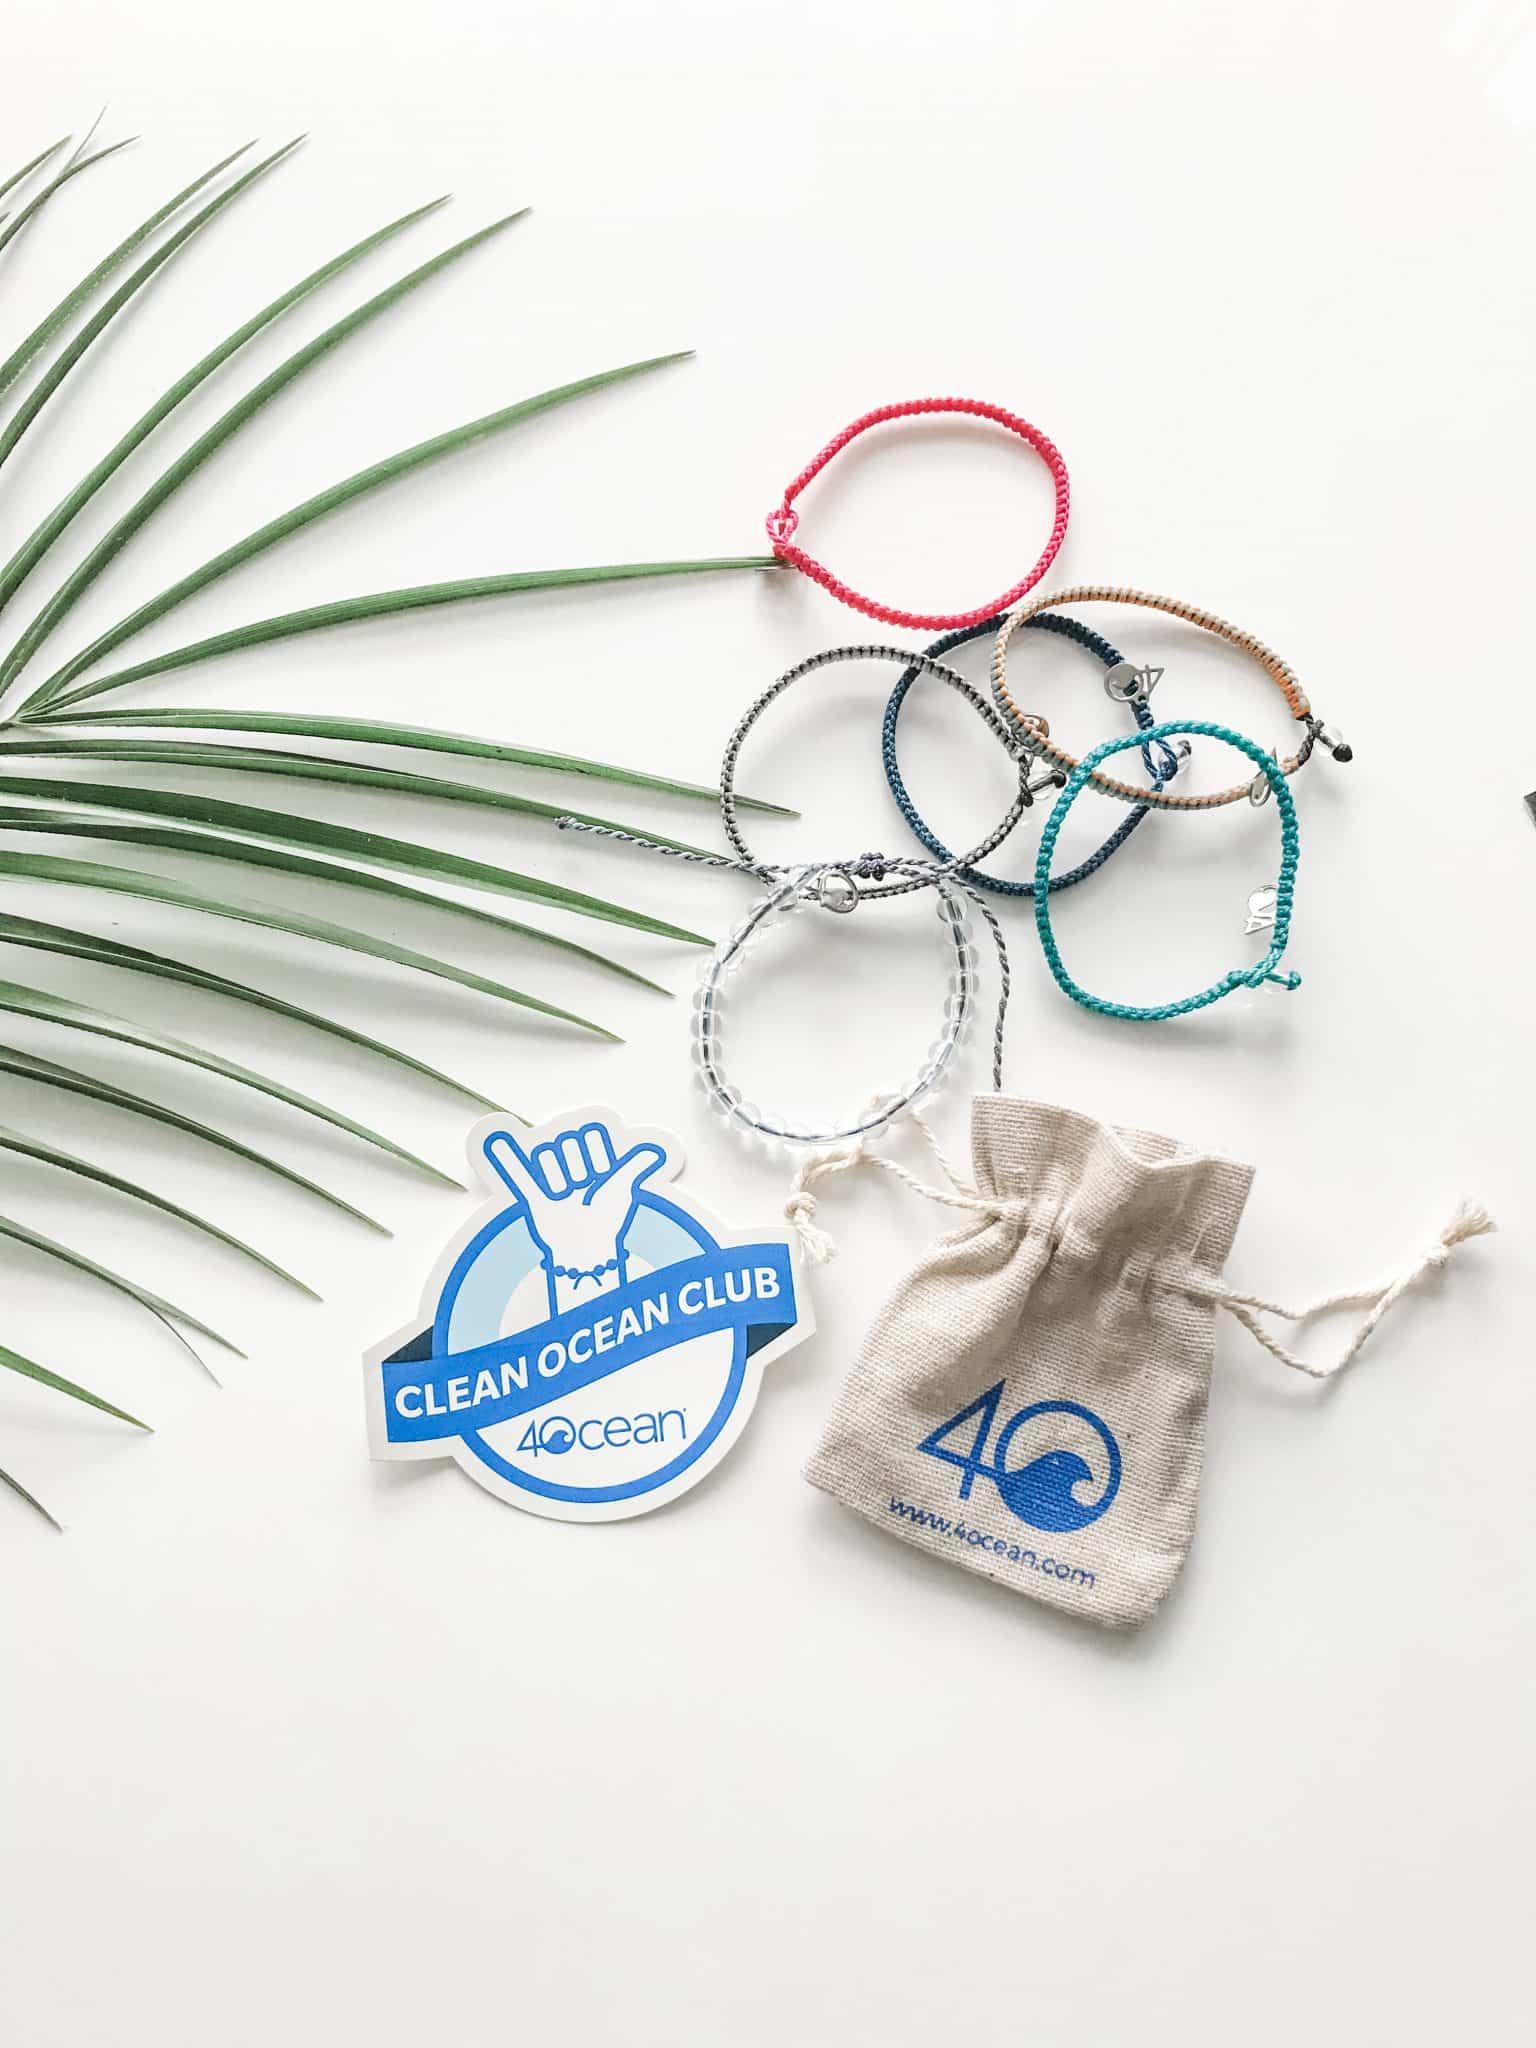 reduce plastic pollution